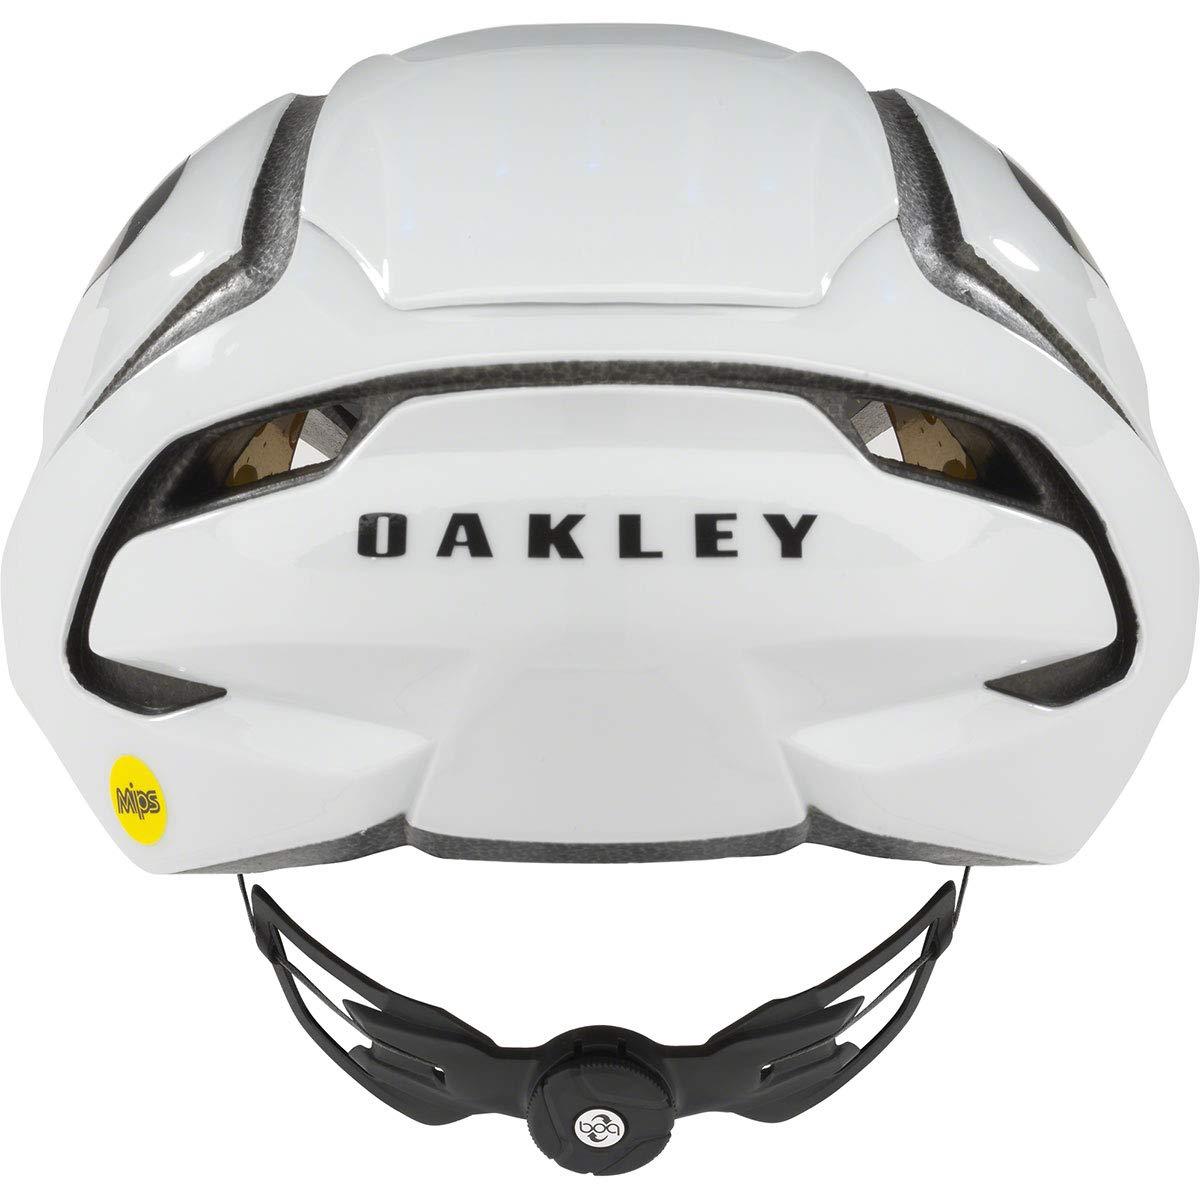 4e82616698 Amazon.com   Oakley ARO5 Men s MTB Cycling Helmet   Sports   Outdoors